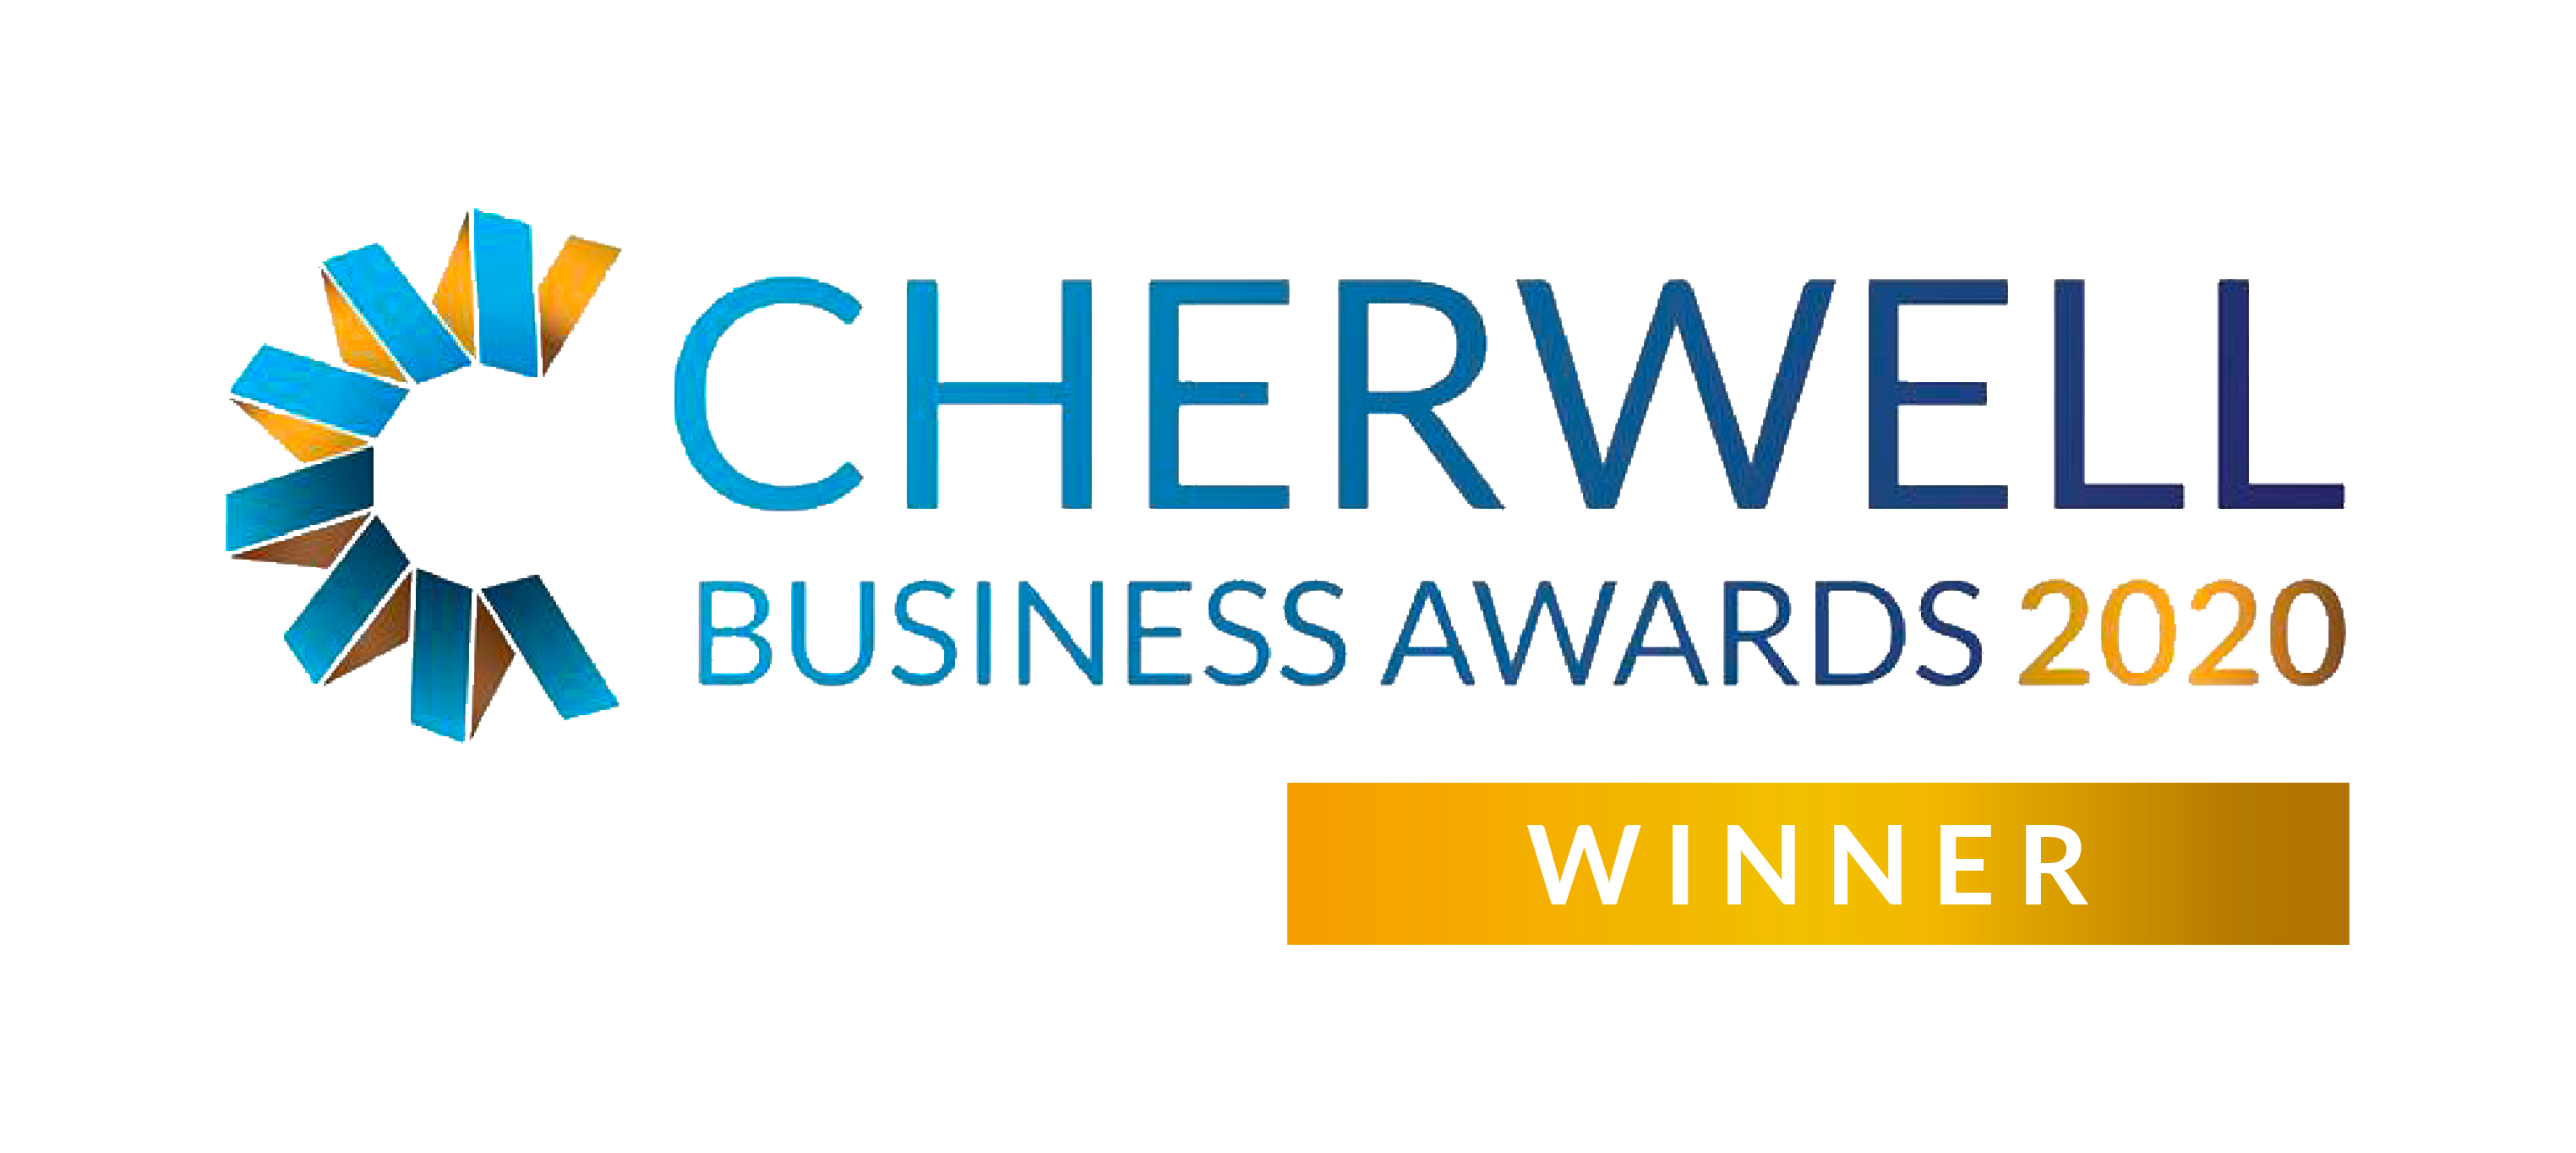 Cherwell Business Awards 2020 Winner